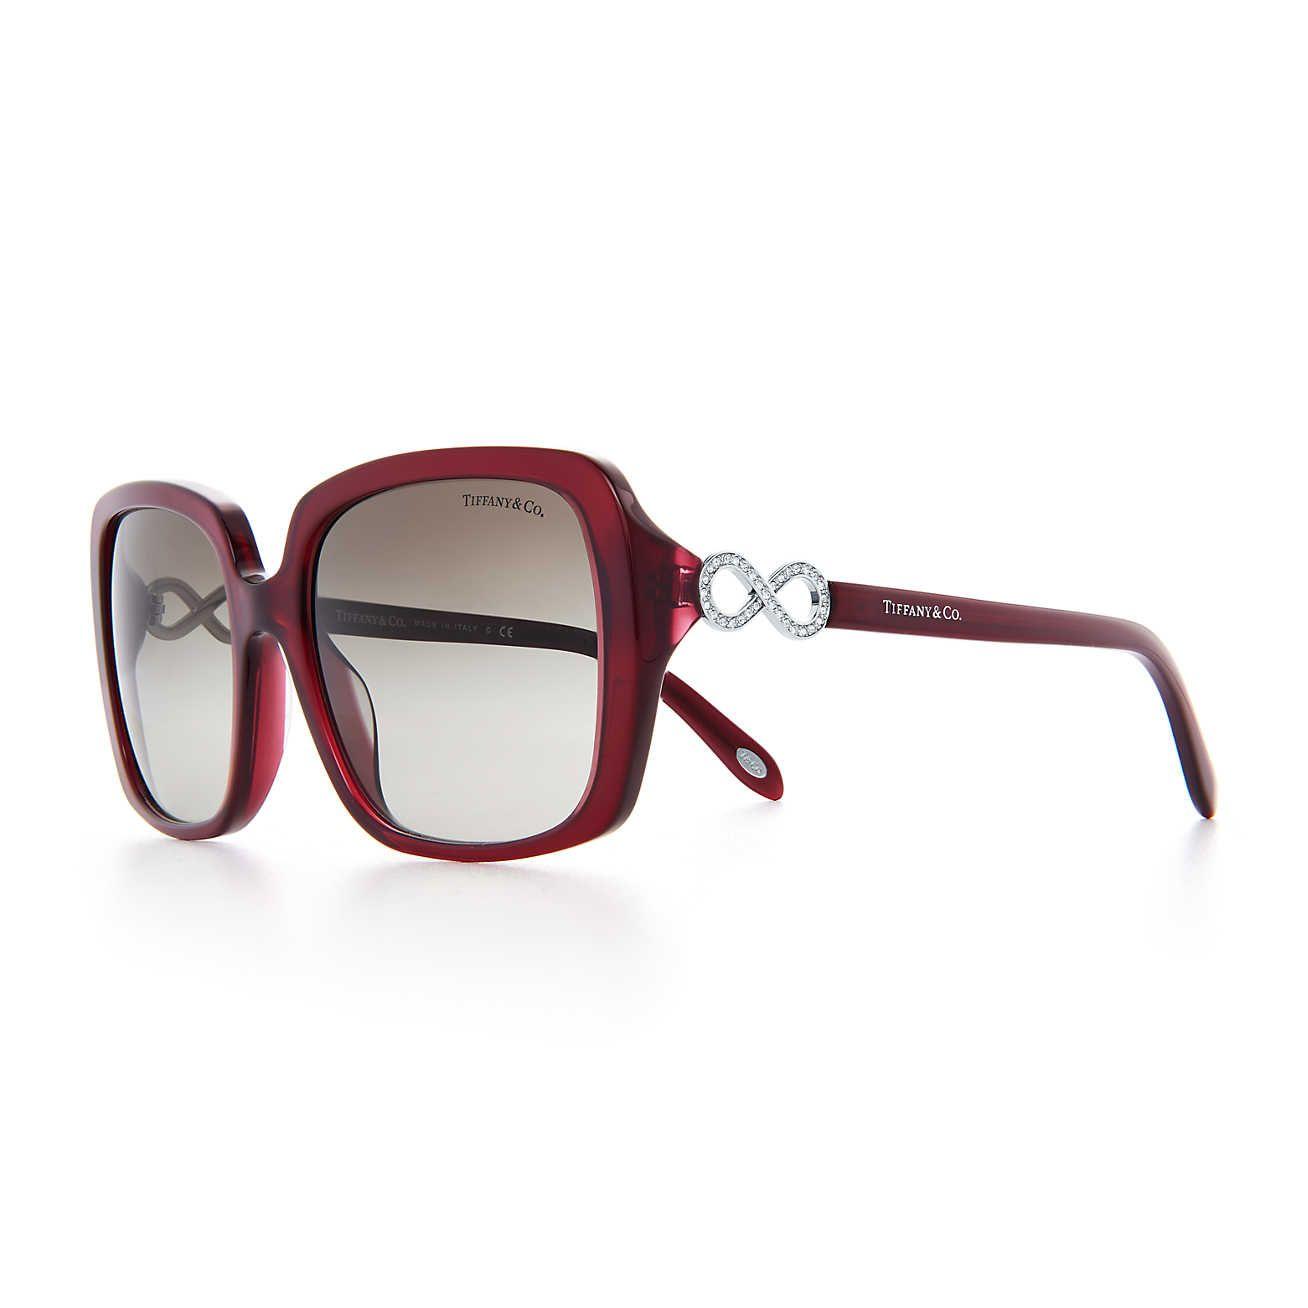 02be32c7217 Tiffany Infinity Square Sunglasses